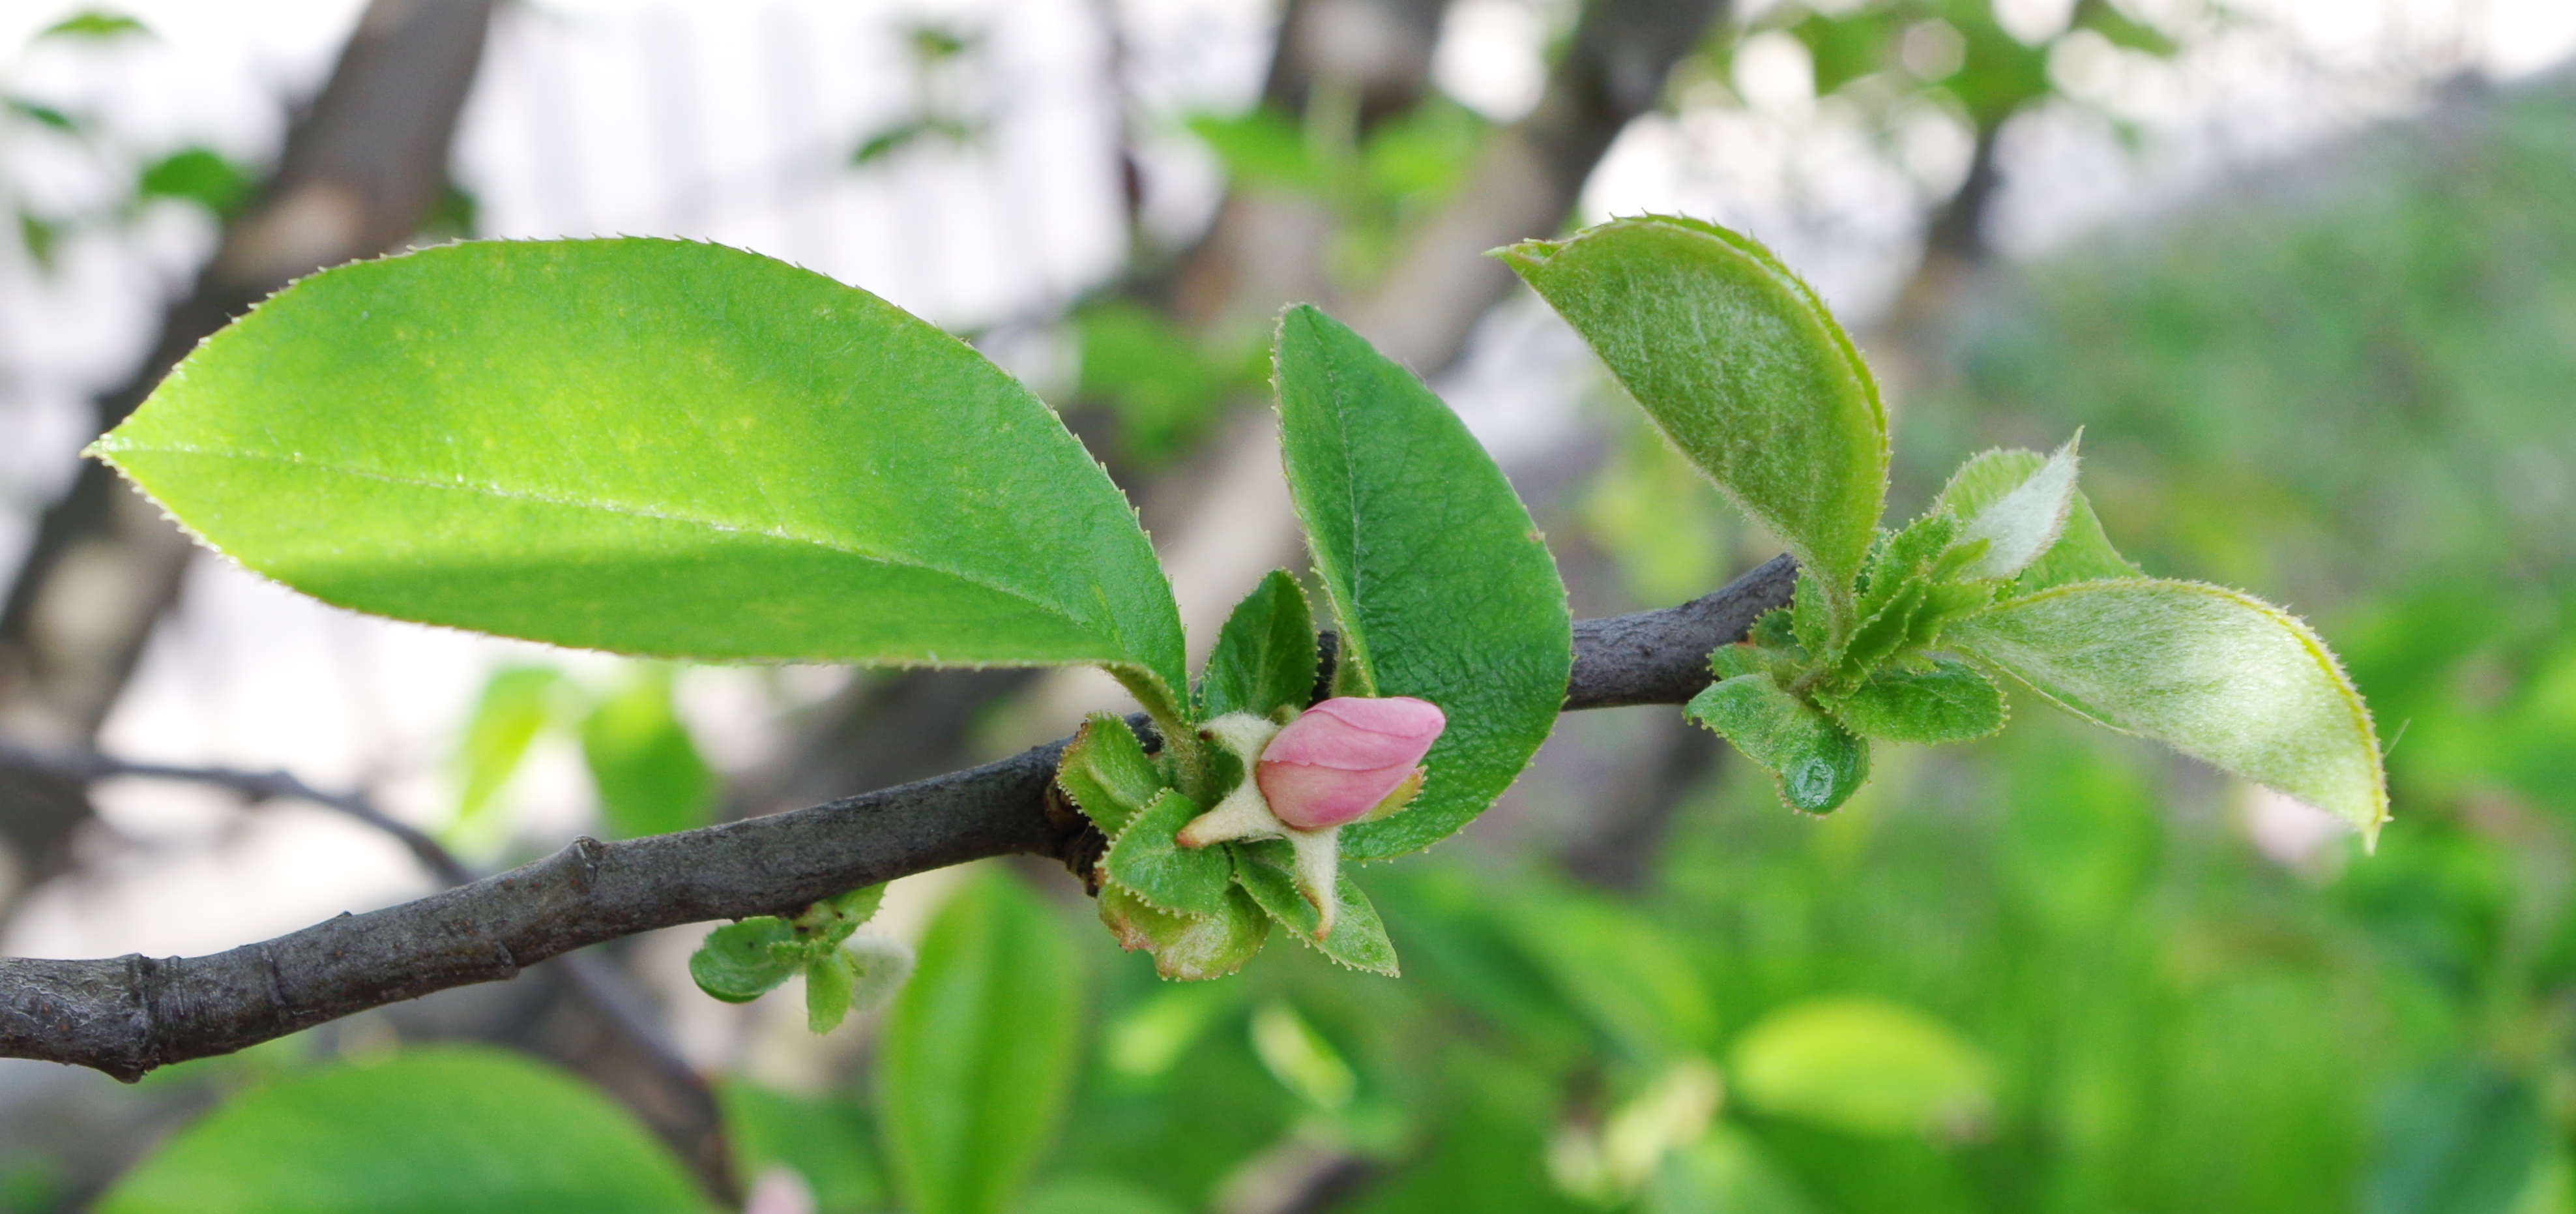 File:Bouton de fleur de cerisier.jpg - Wikimedia Commons